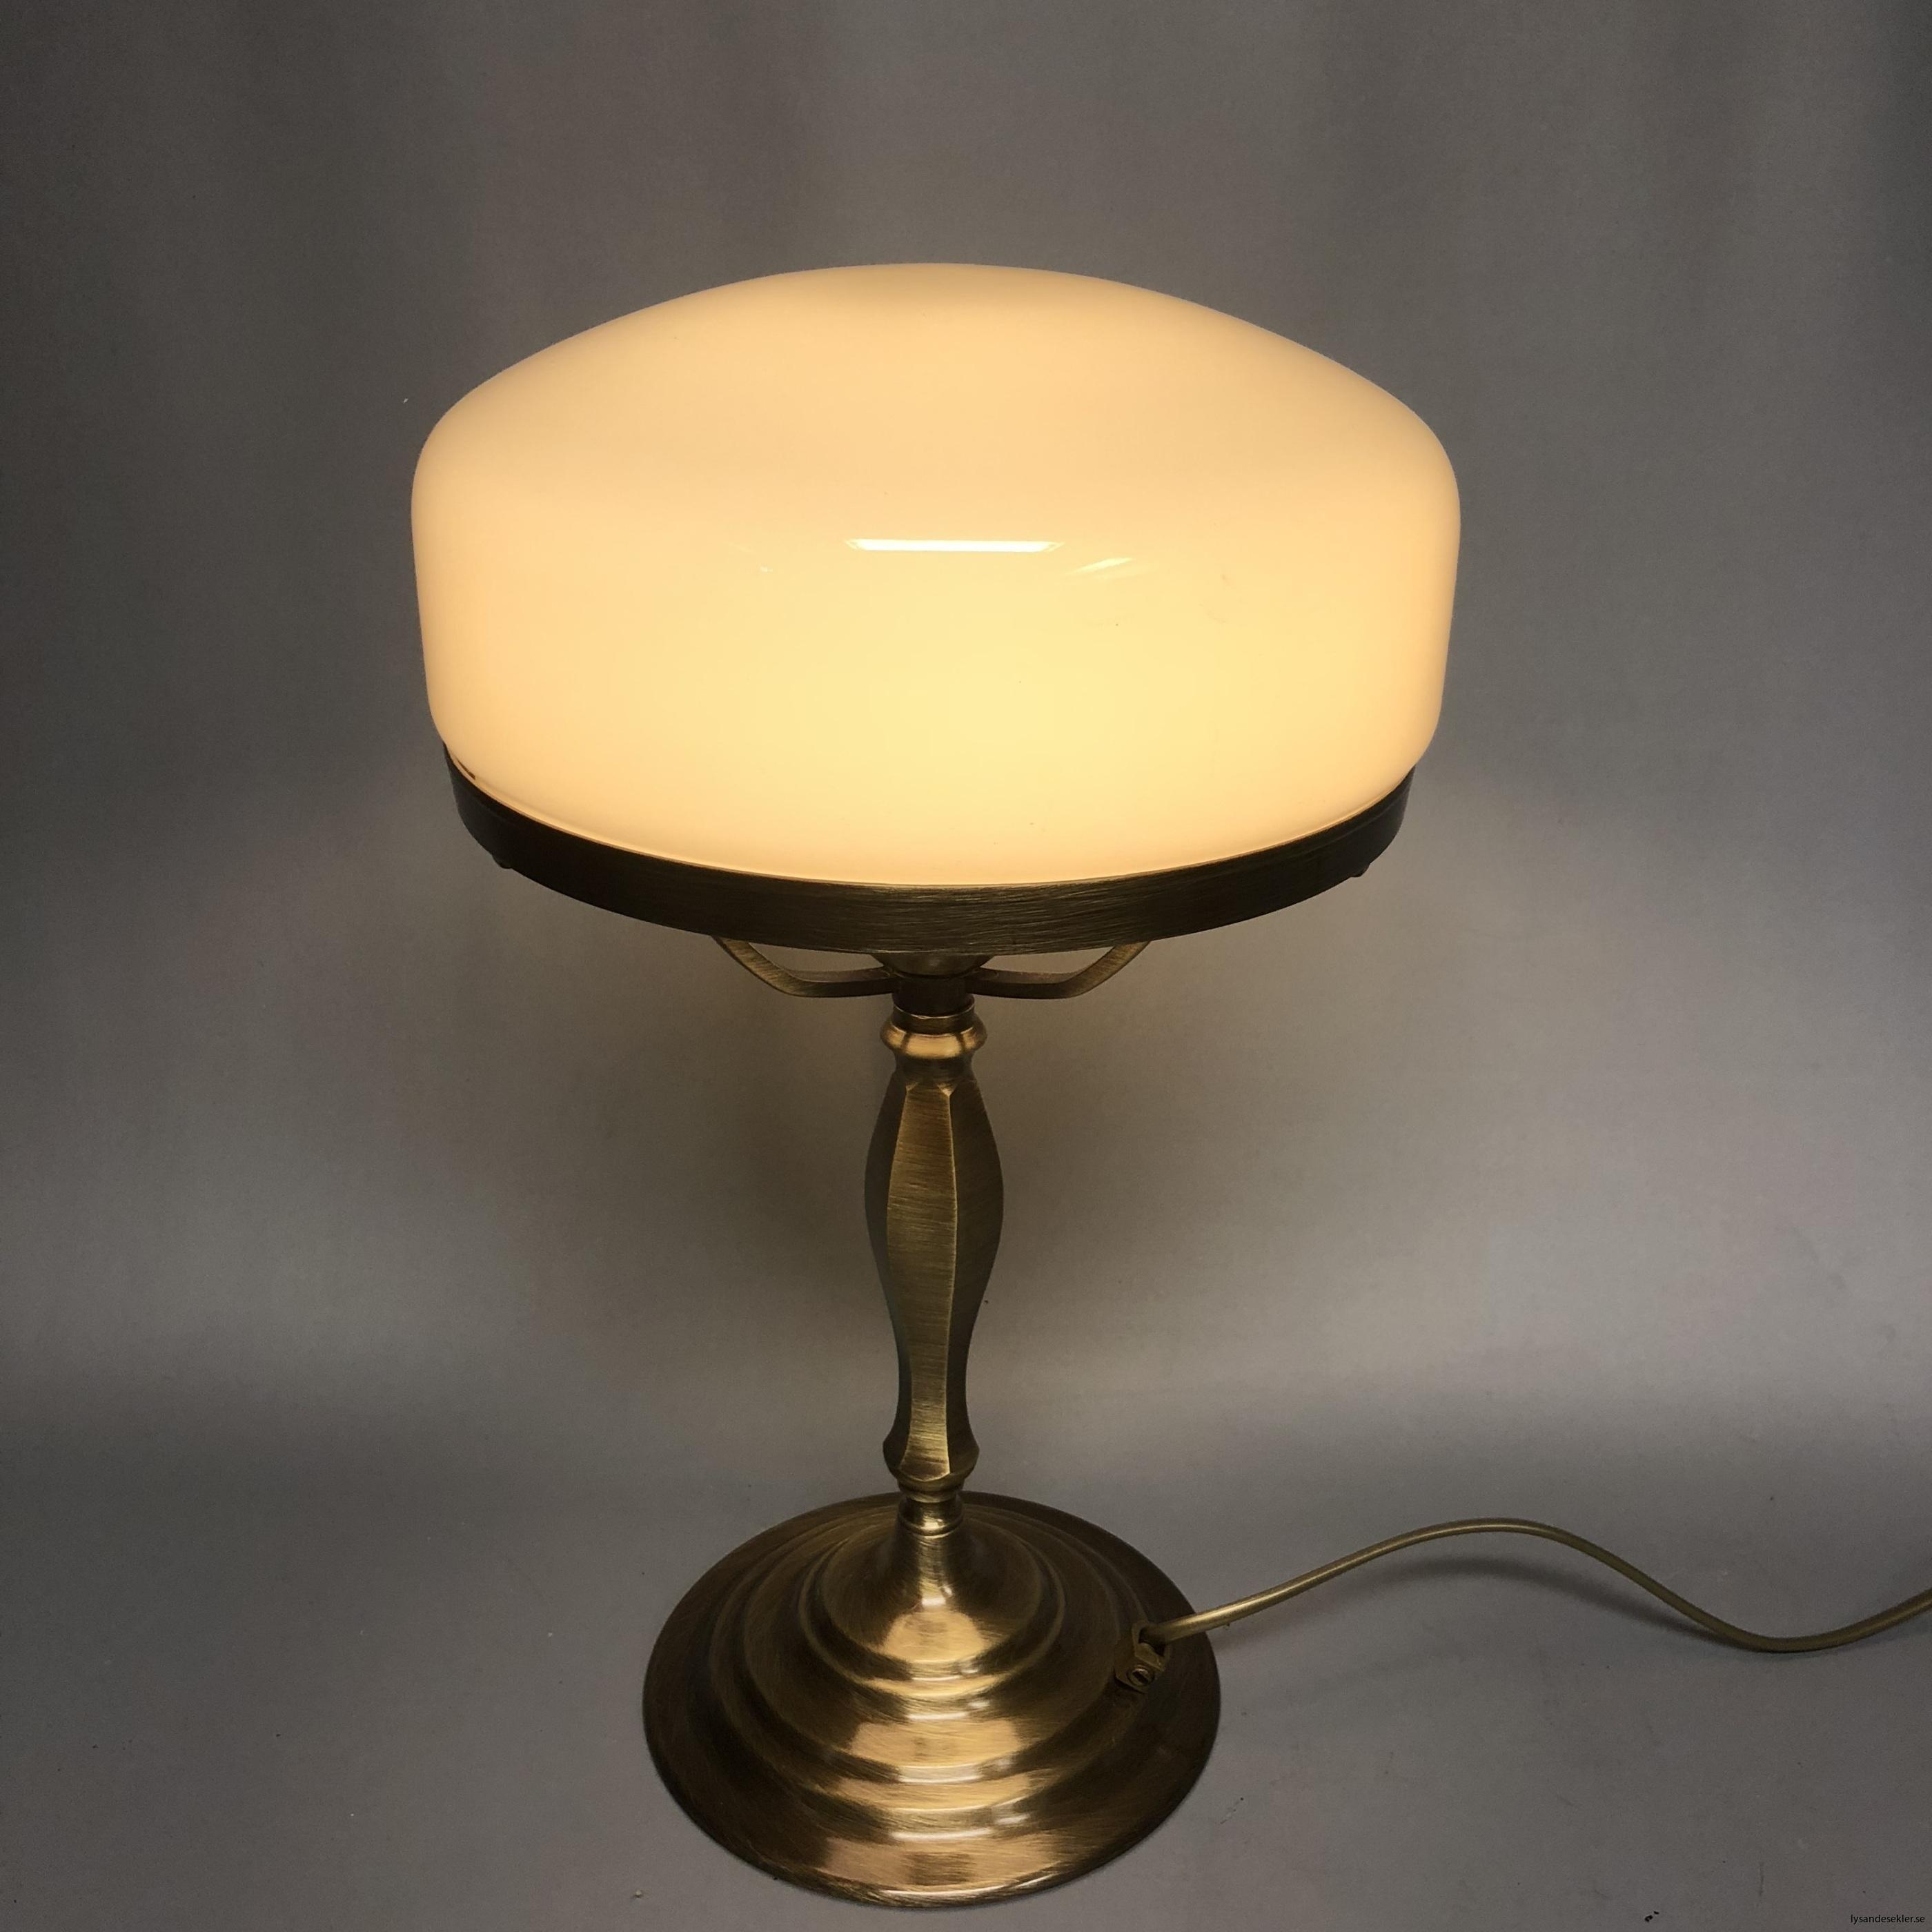 strindbergslampa strindbergslampor strindberg lampa skärm kupa strindbergsskärm strindbergskupa47